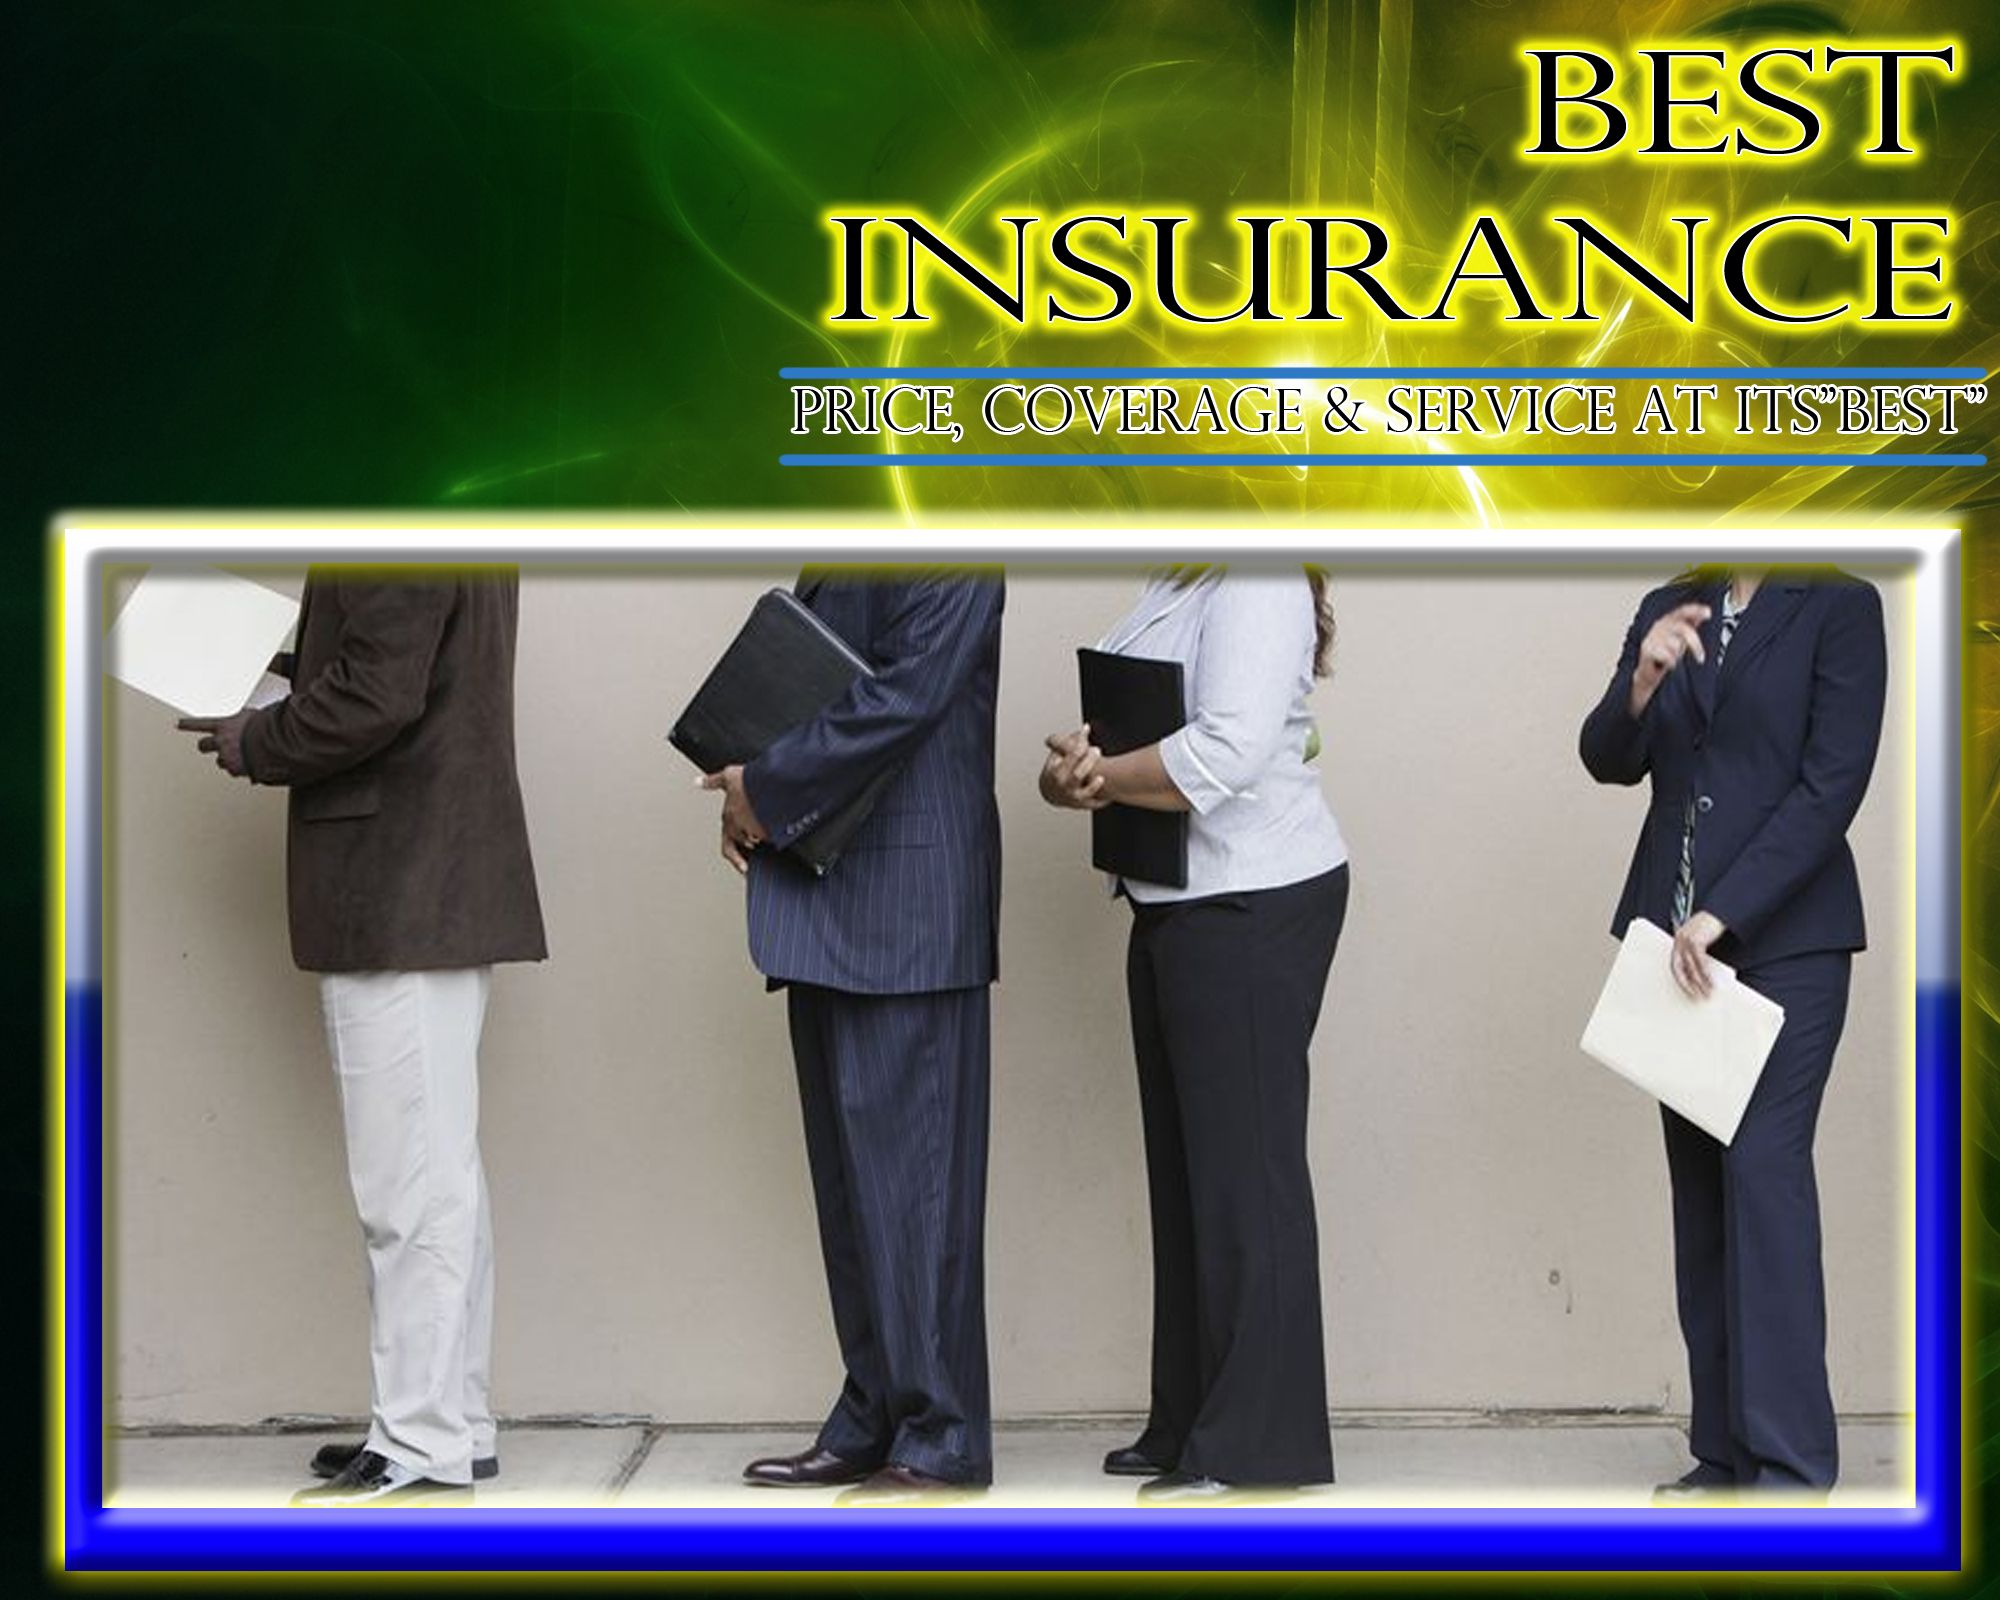 HomeOwnersInsuranceFortLauderdale Unemployment Insurance